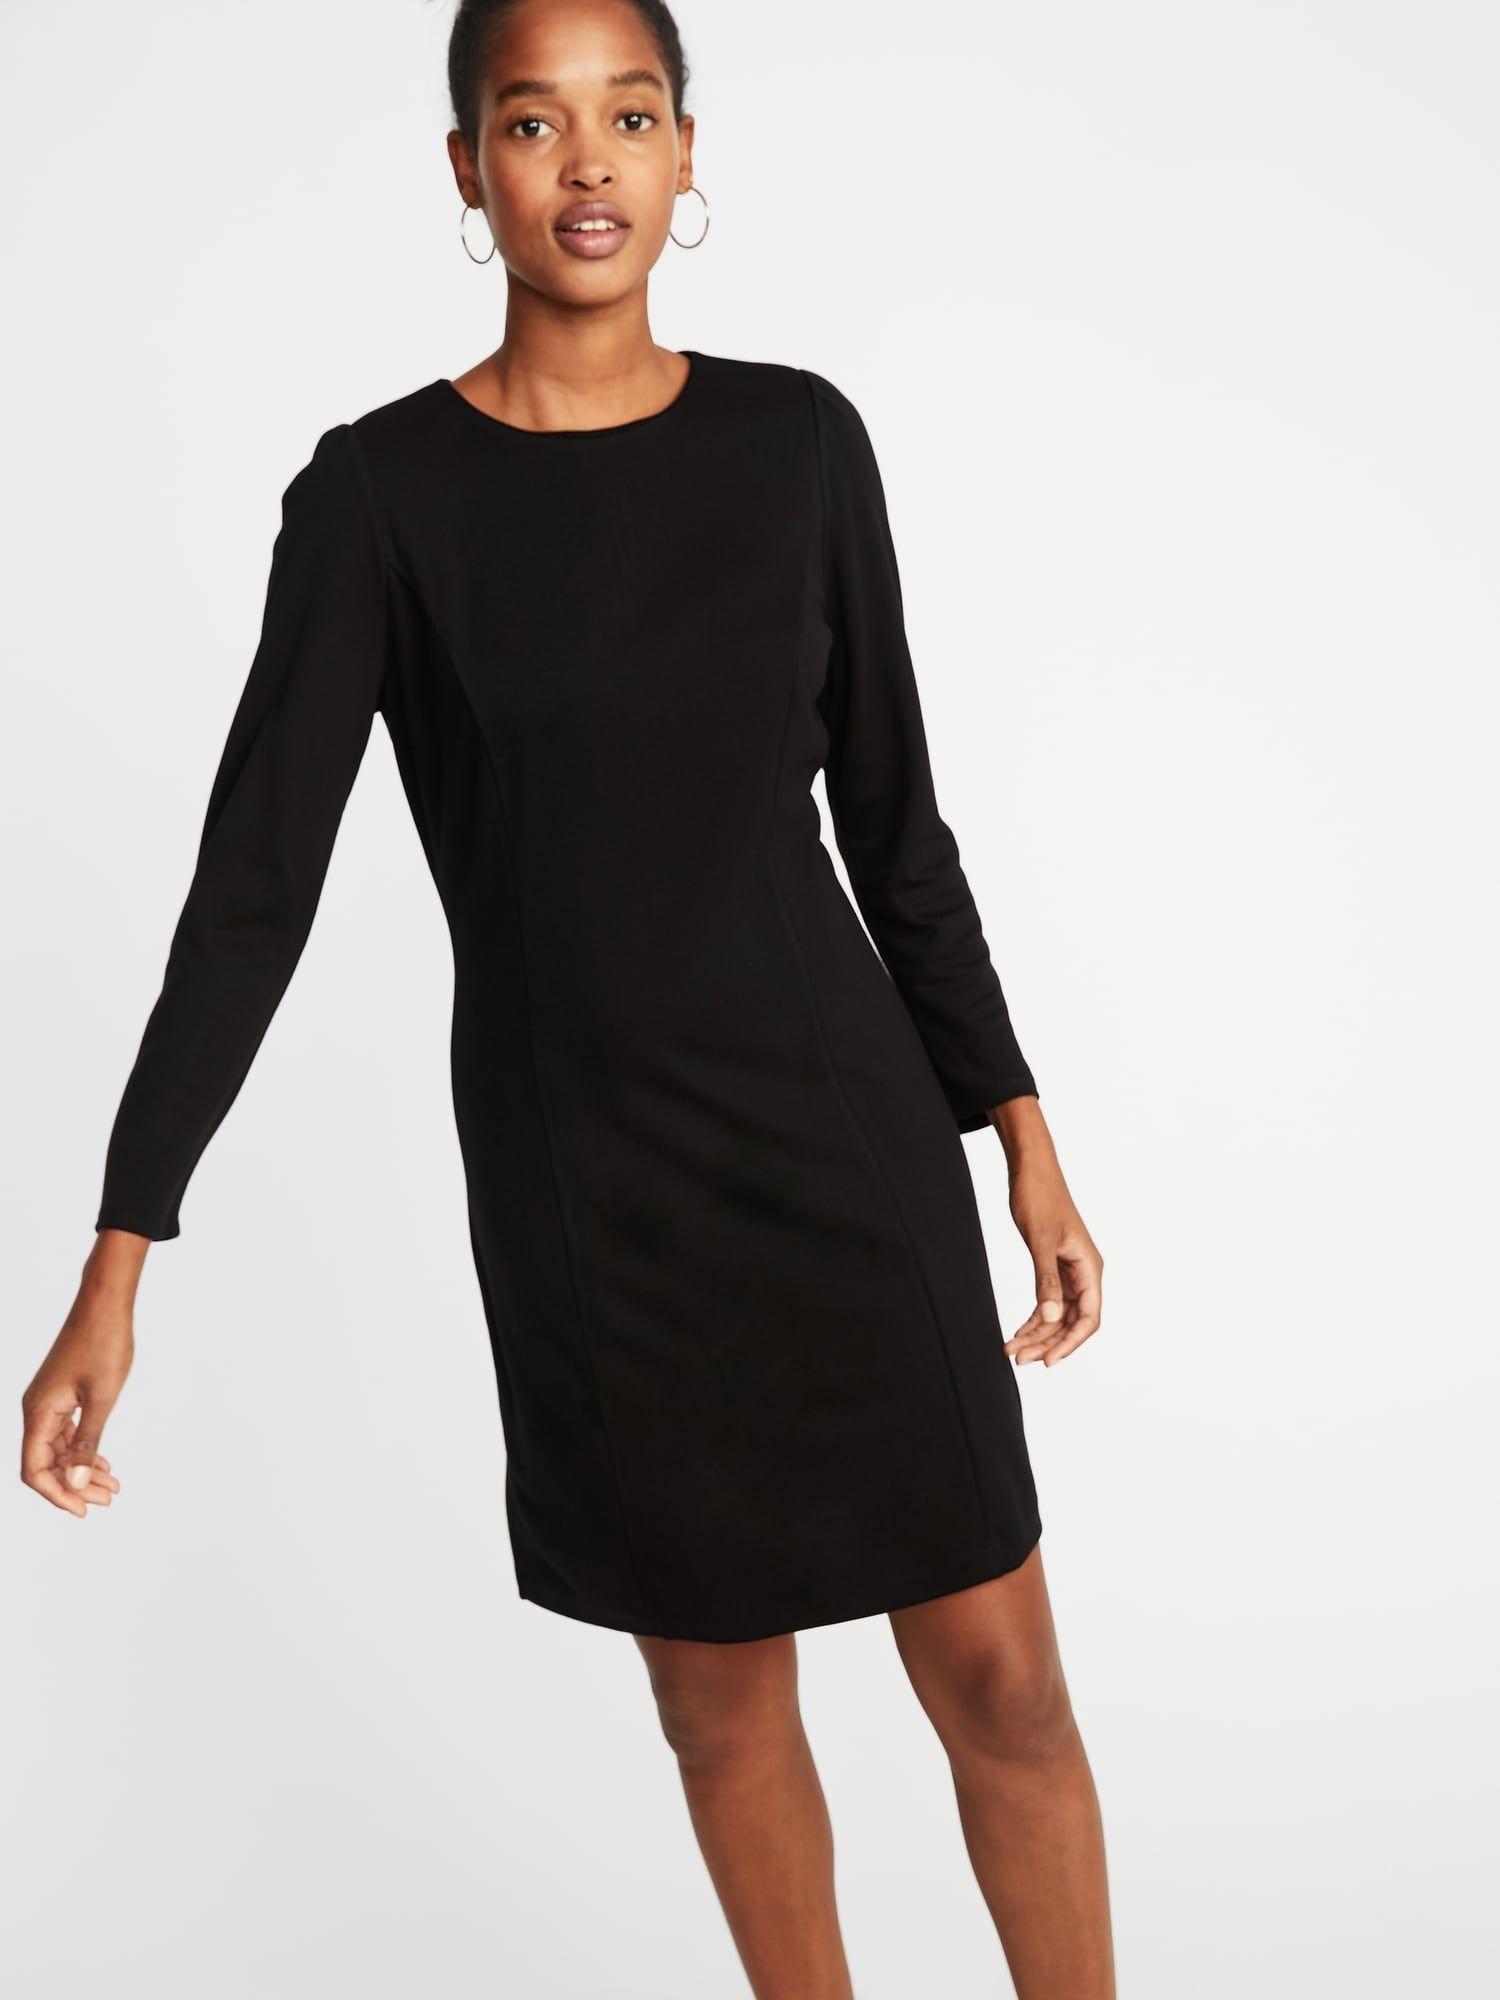 652a89fcd58 Ponte-Knit Shirred-Sleeve Sheath Dress for Women in 2019